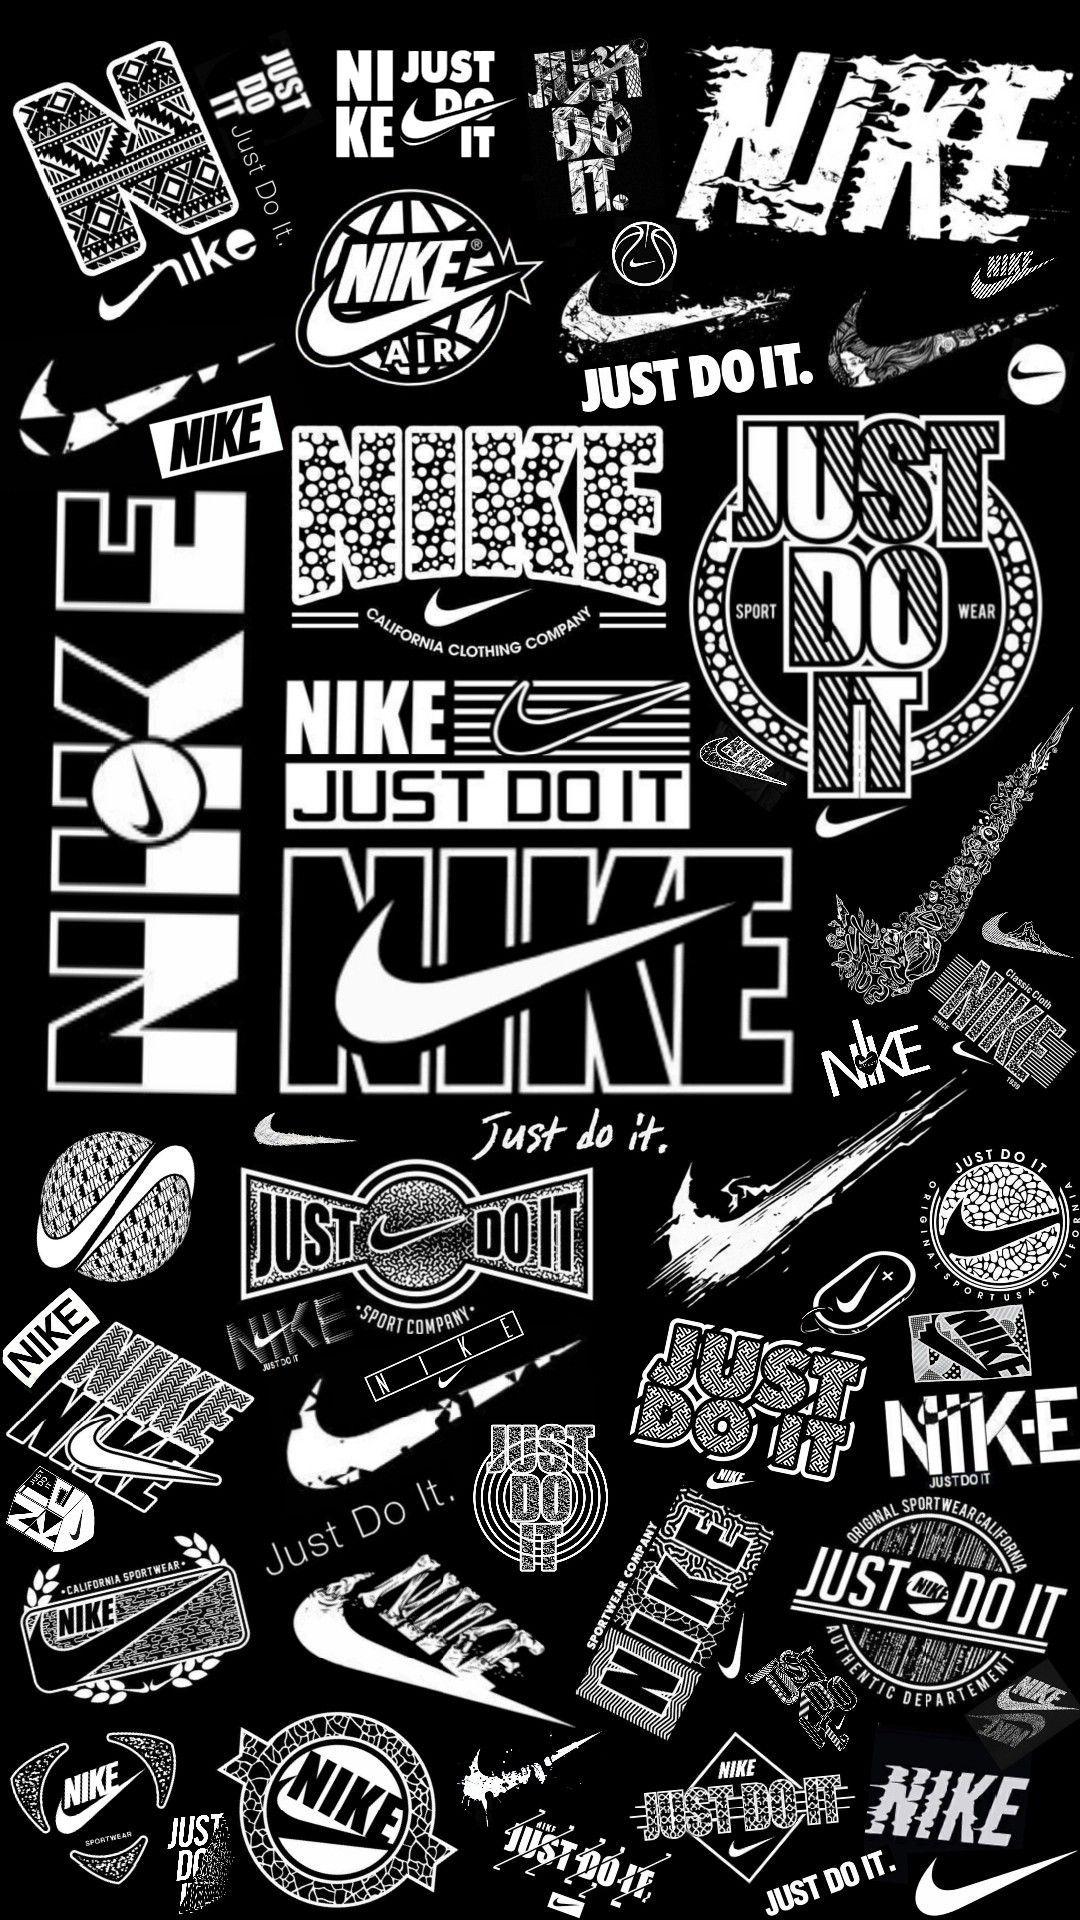 Nike Wallpaper Nike Wallpaper In 2020 Nike Wallpaper Nike Wallpaper Backgrounds Nike Wallpaper Iphone